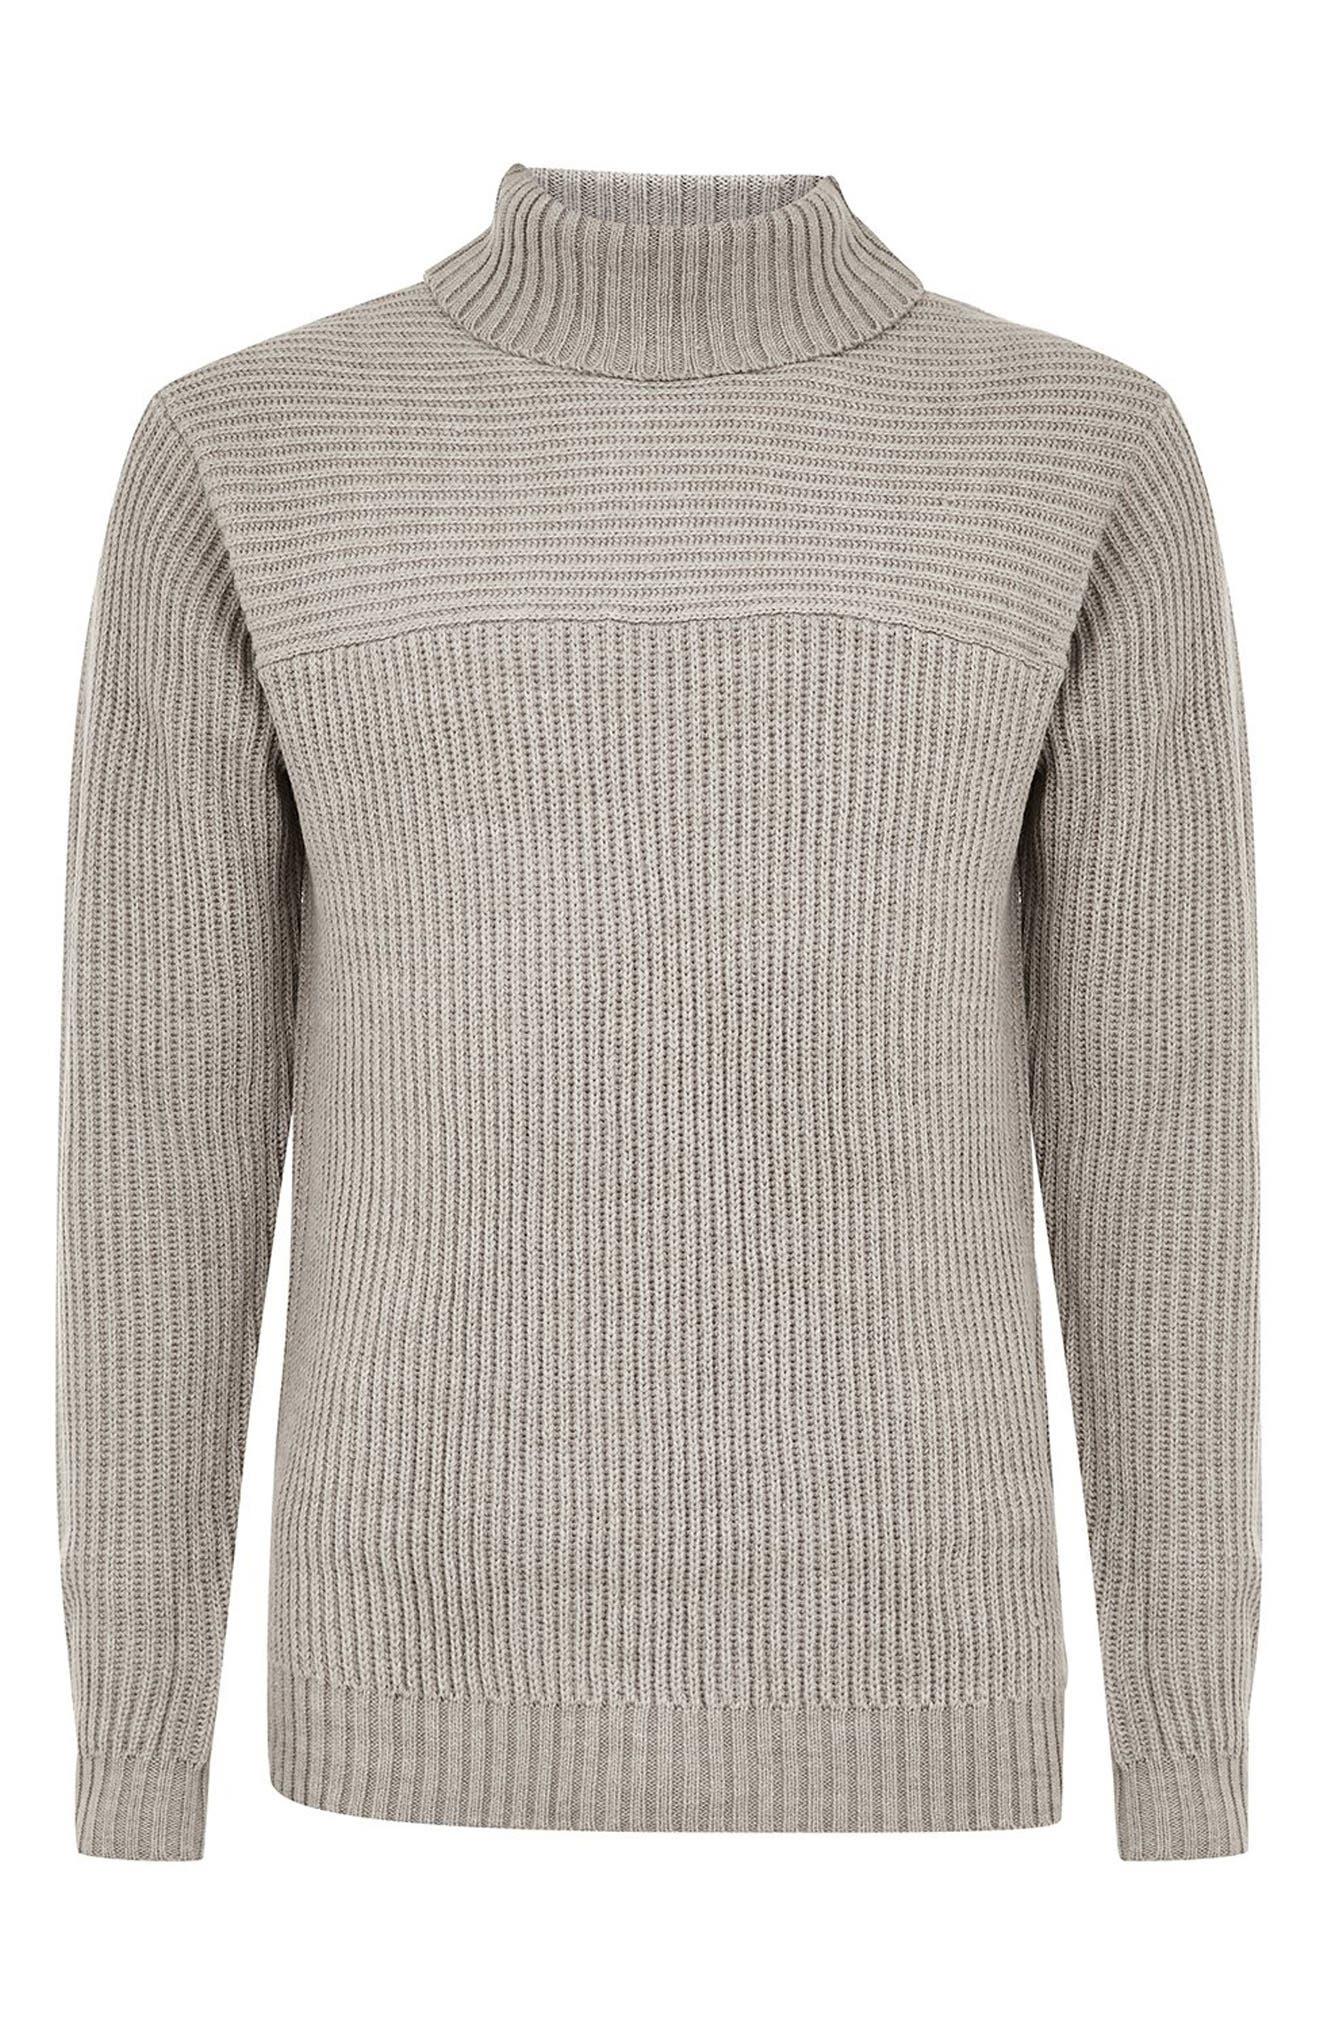 Flint Ribbed Turtleneck Sweater,                             Alternate thumbnail 4, color,                             020